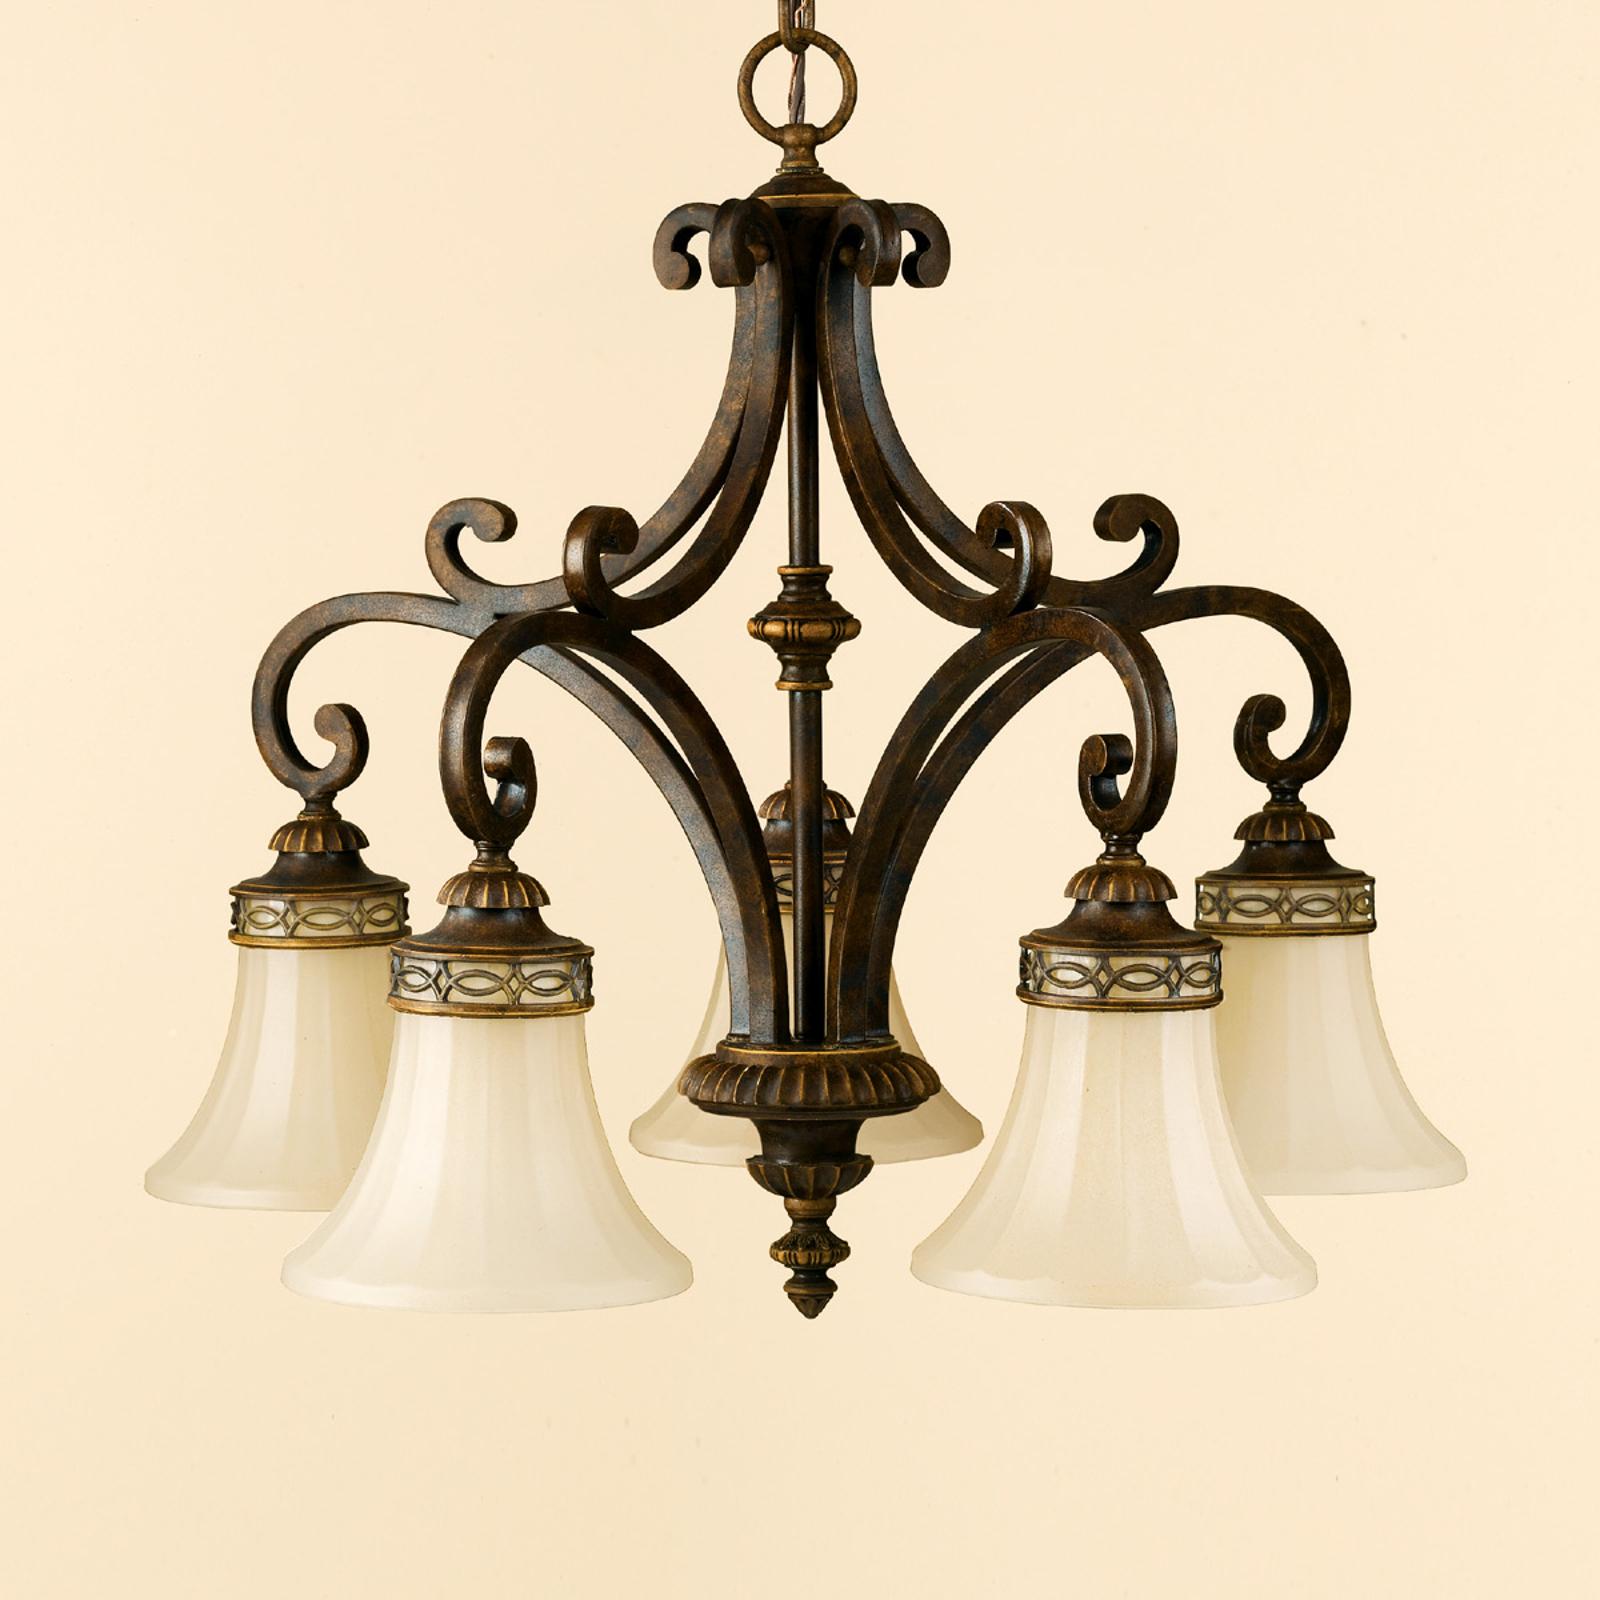 Drawing Room Hanging Light Five Bulbs_3048074_1